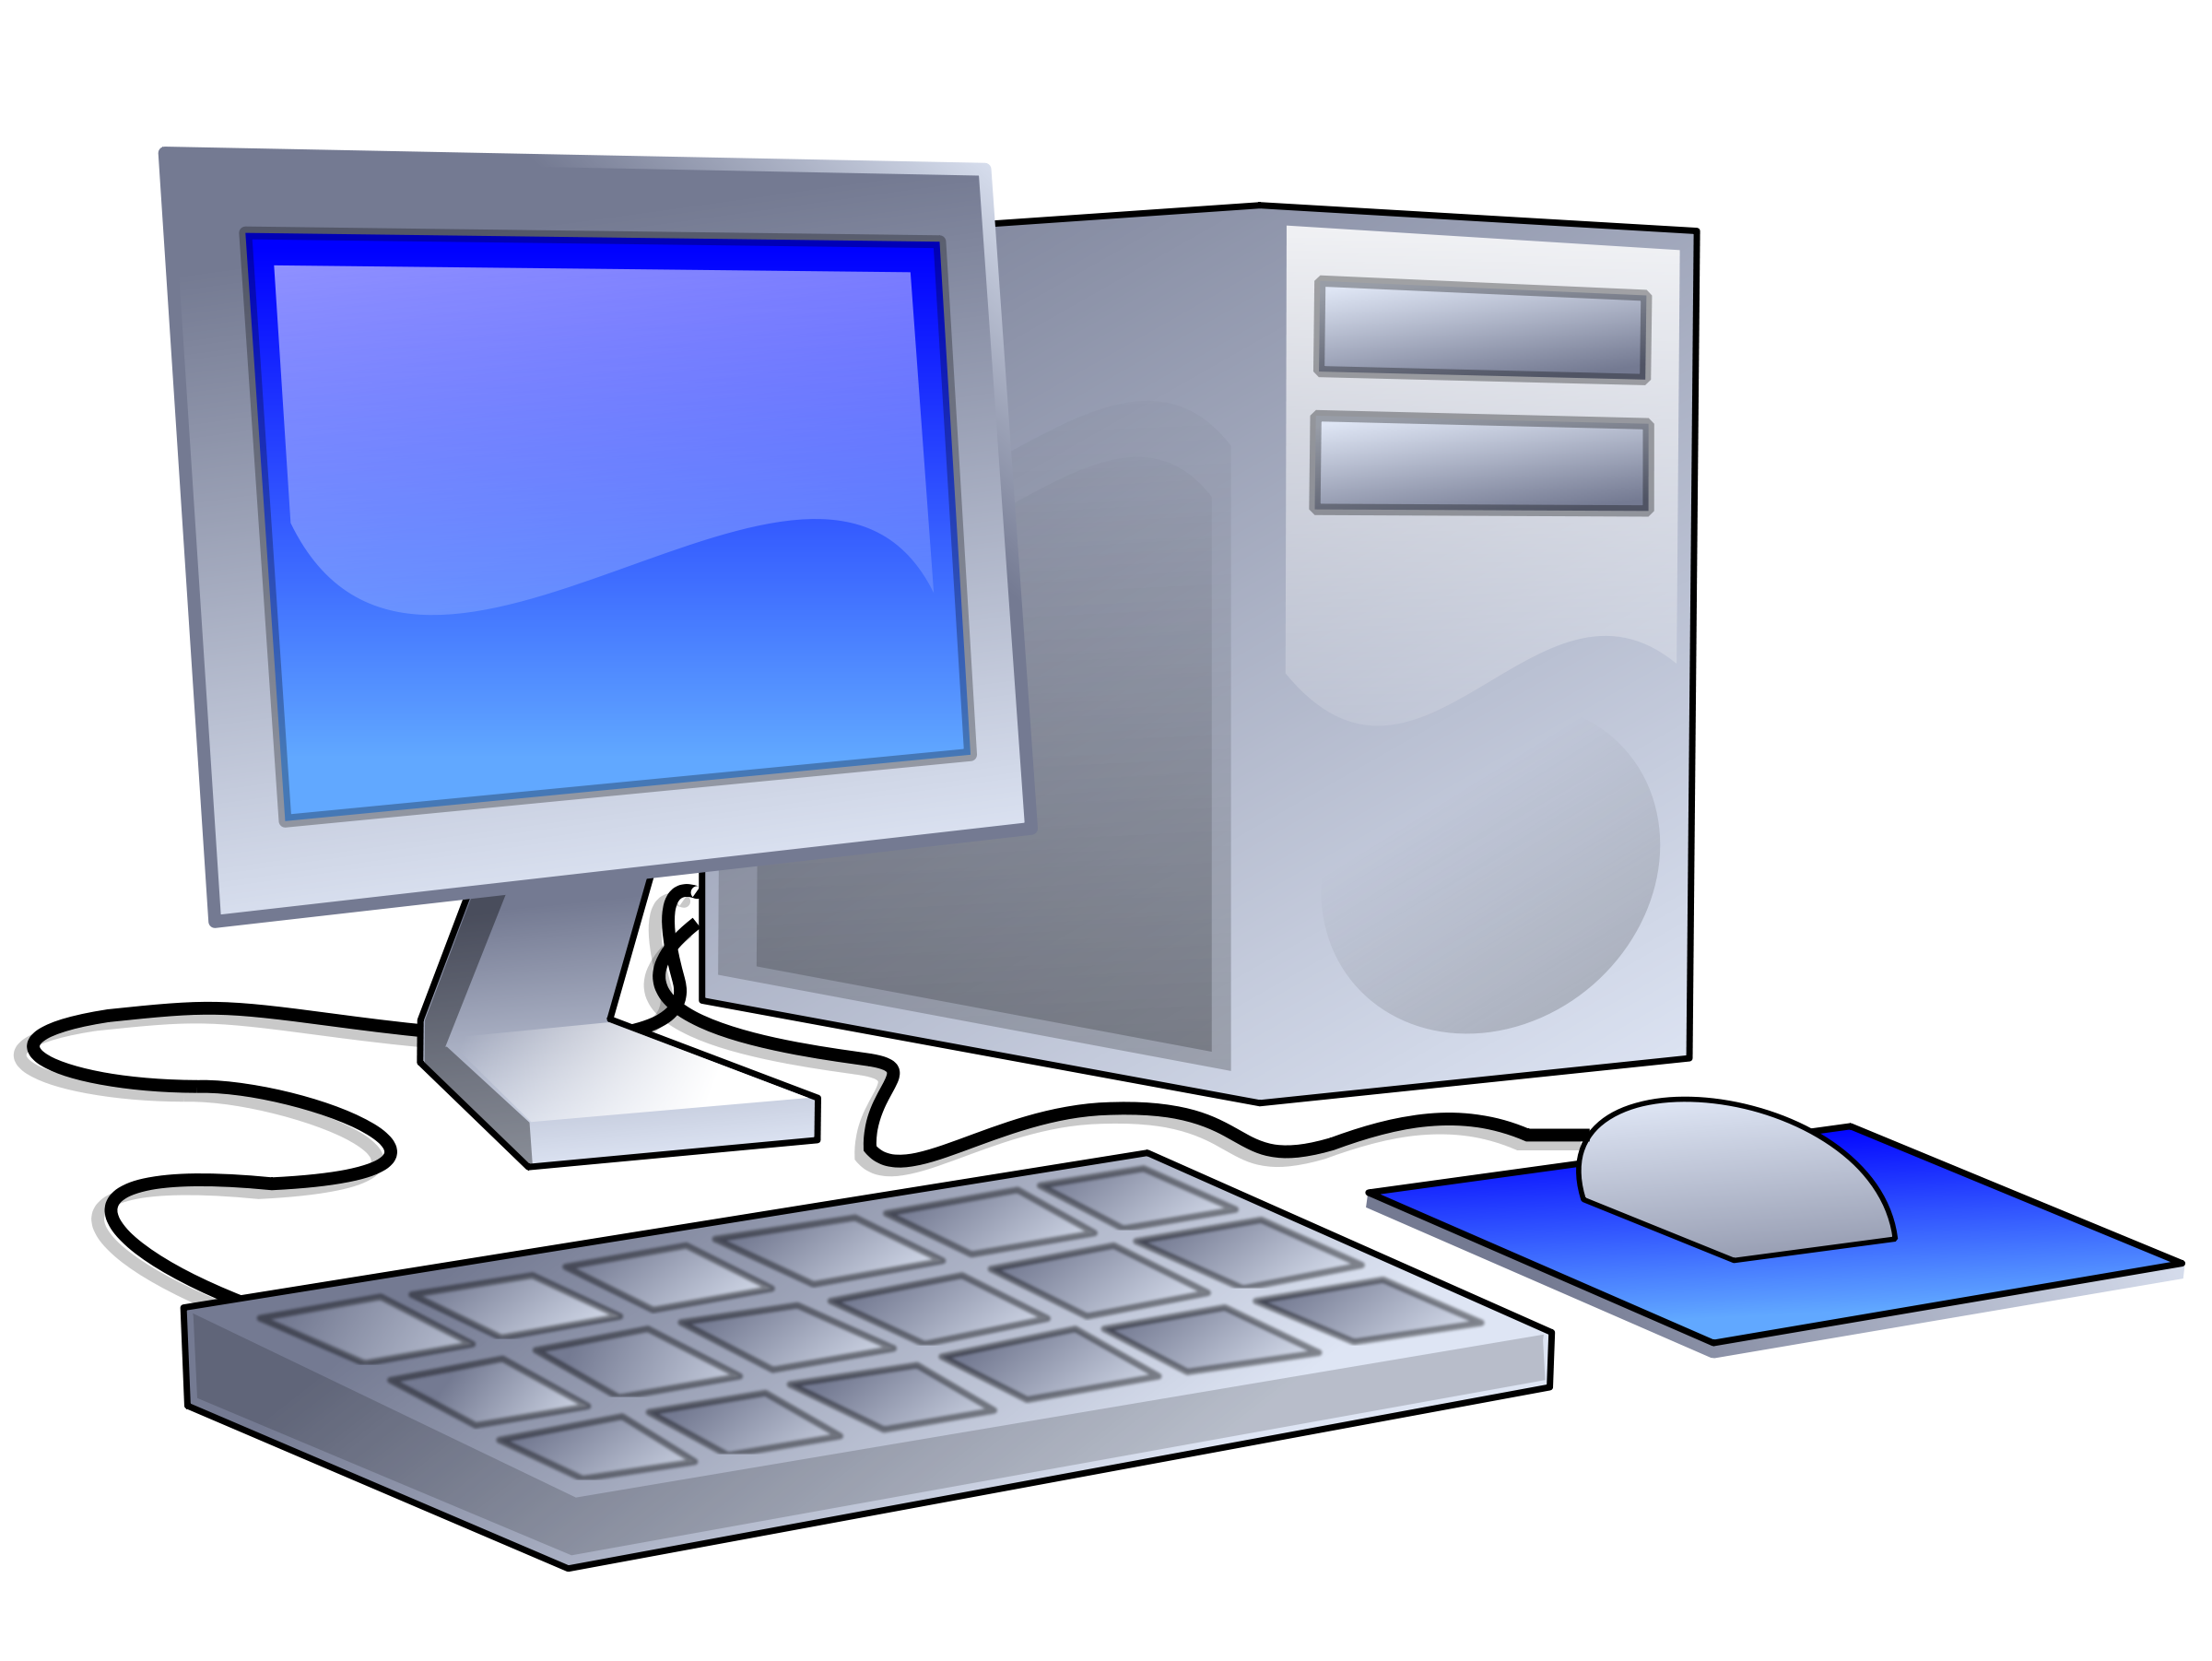 Literacy clipart computer literacy, Literacy computer.